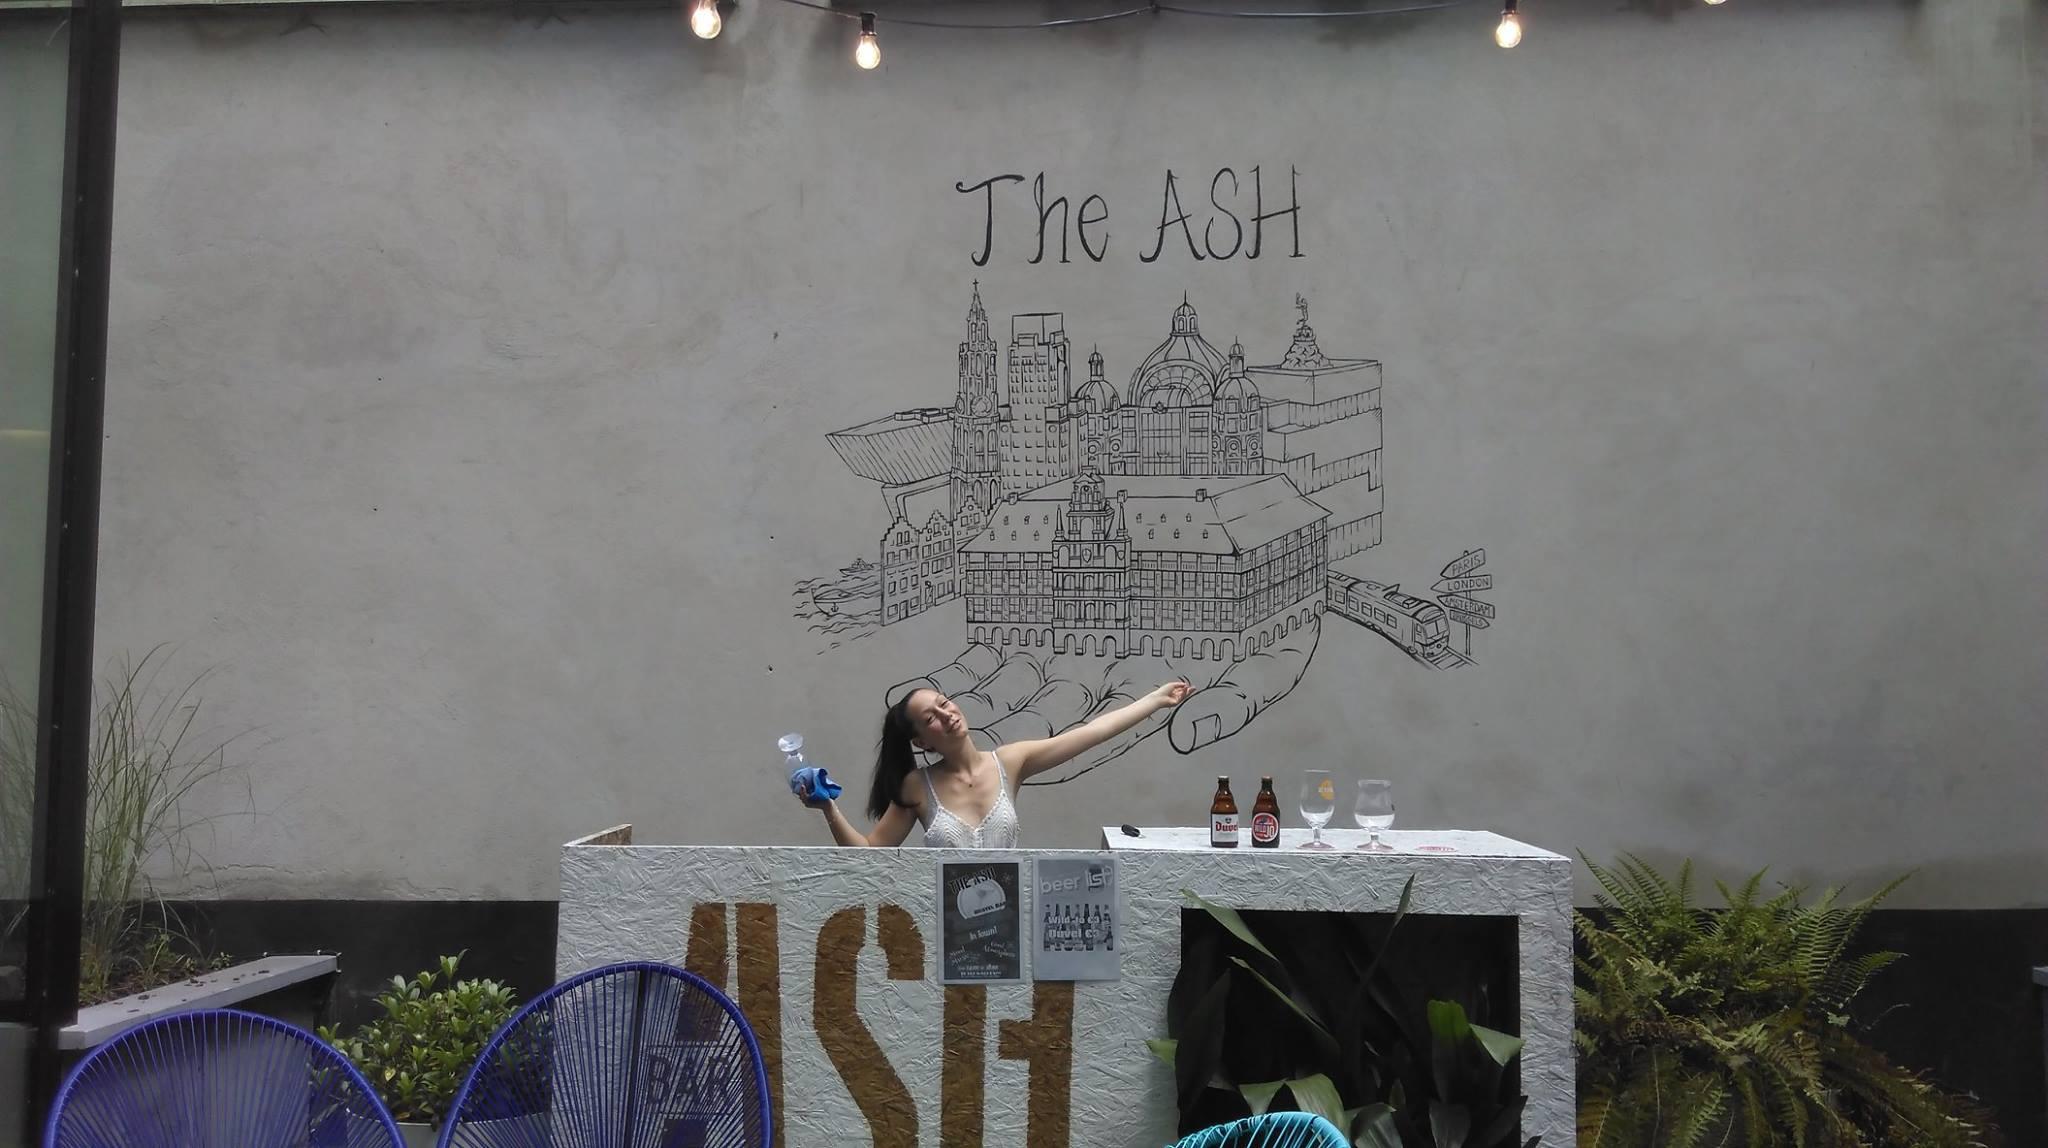 HOSTEL - The ASH